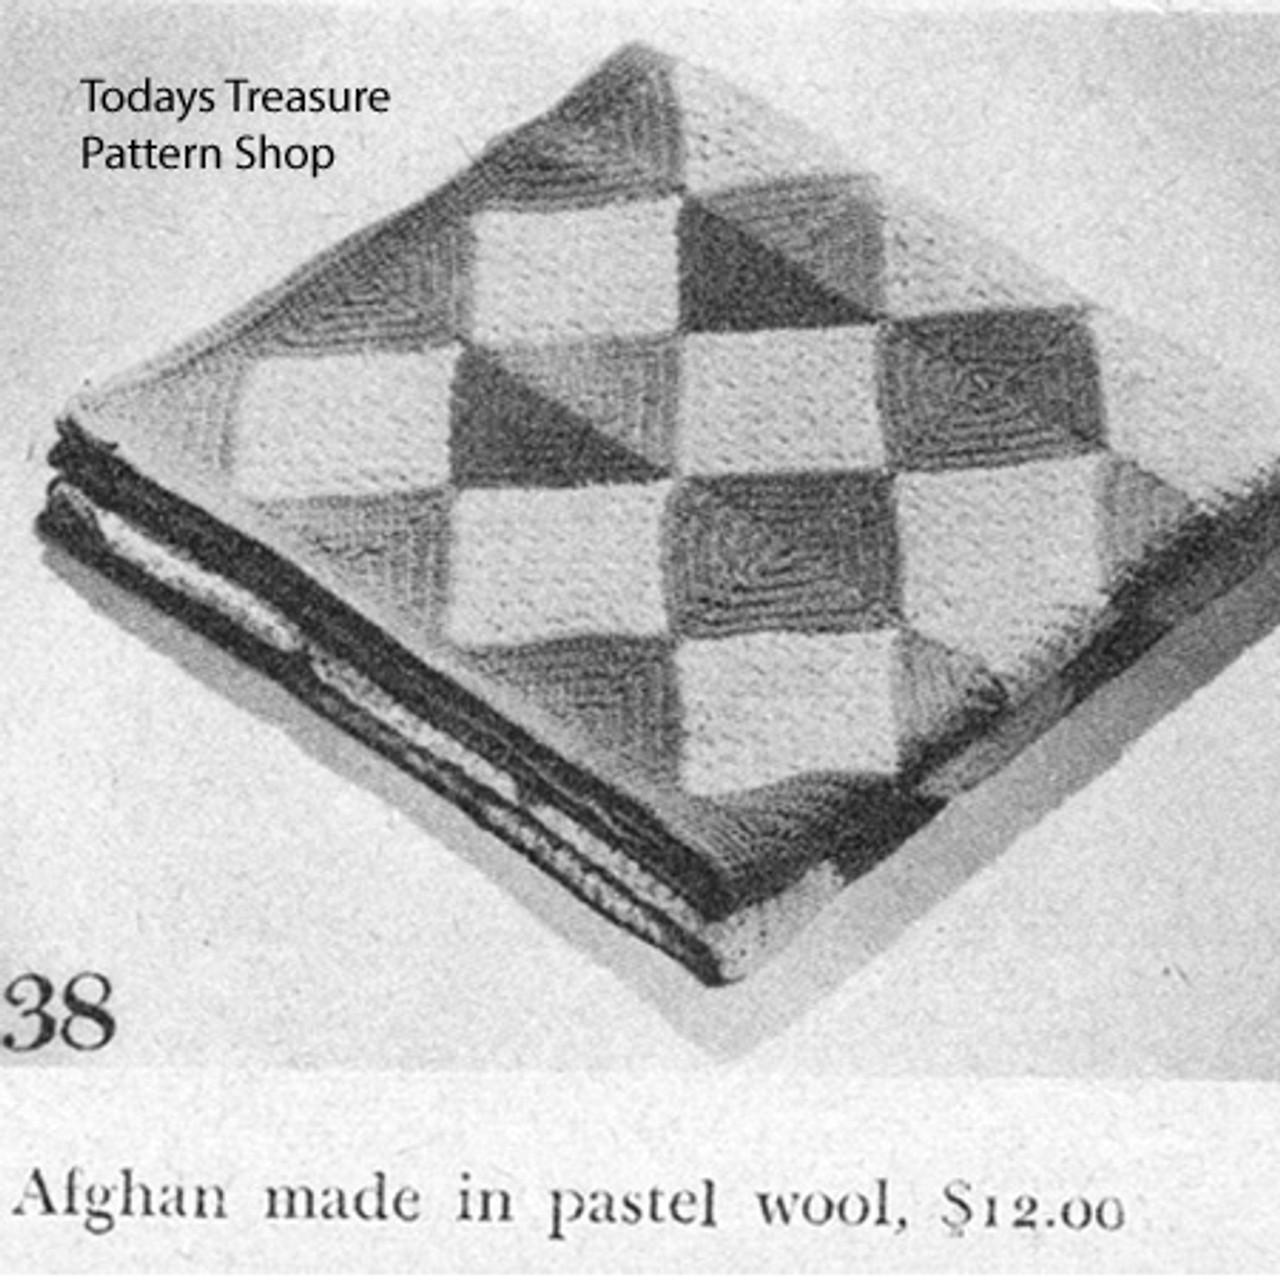 Harlequin Crochet Afghan Pattern